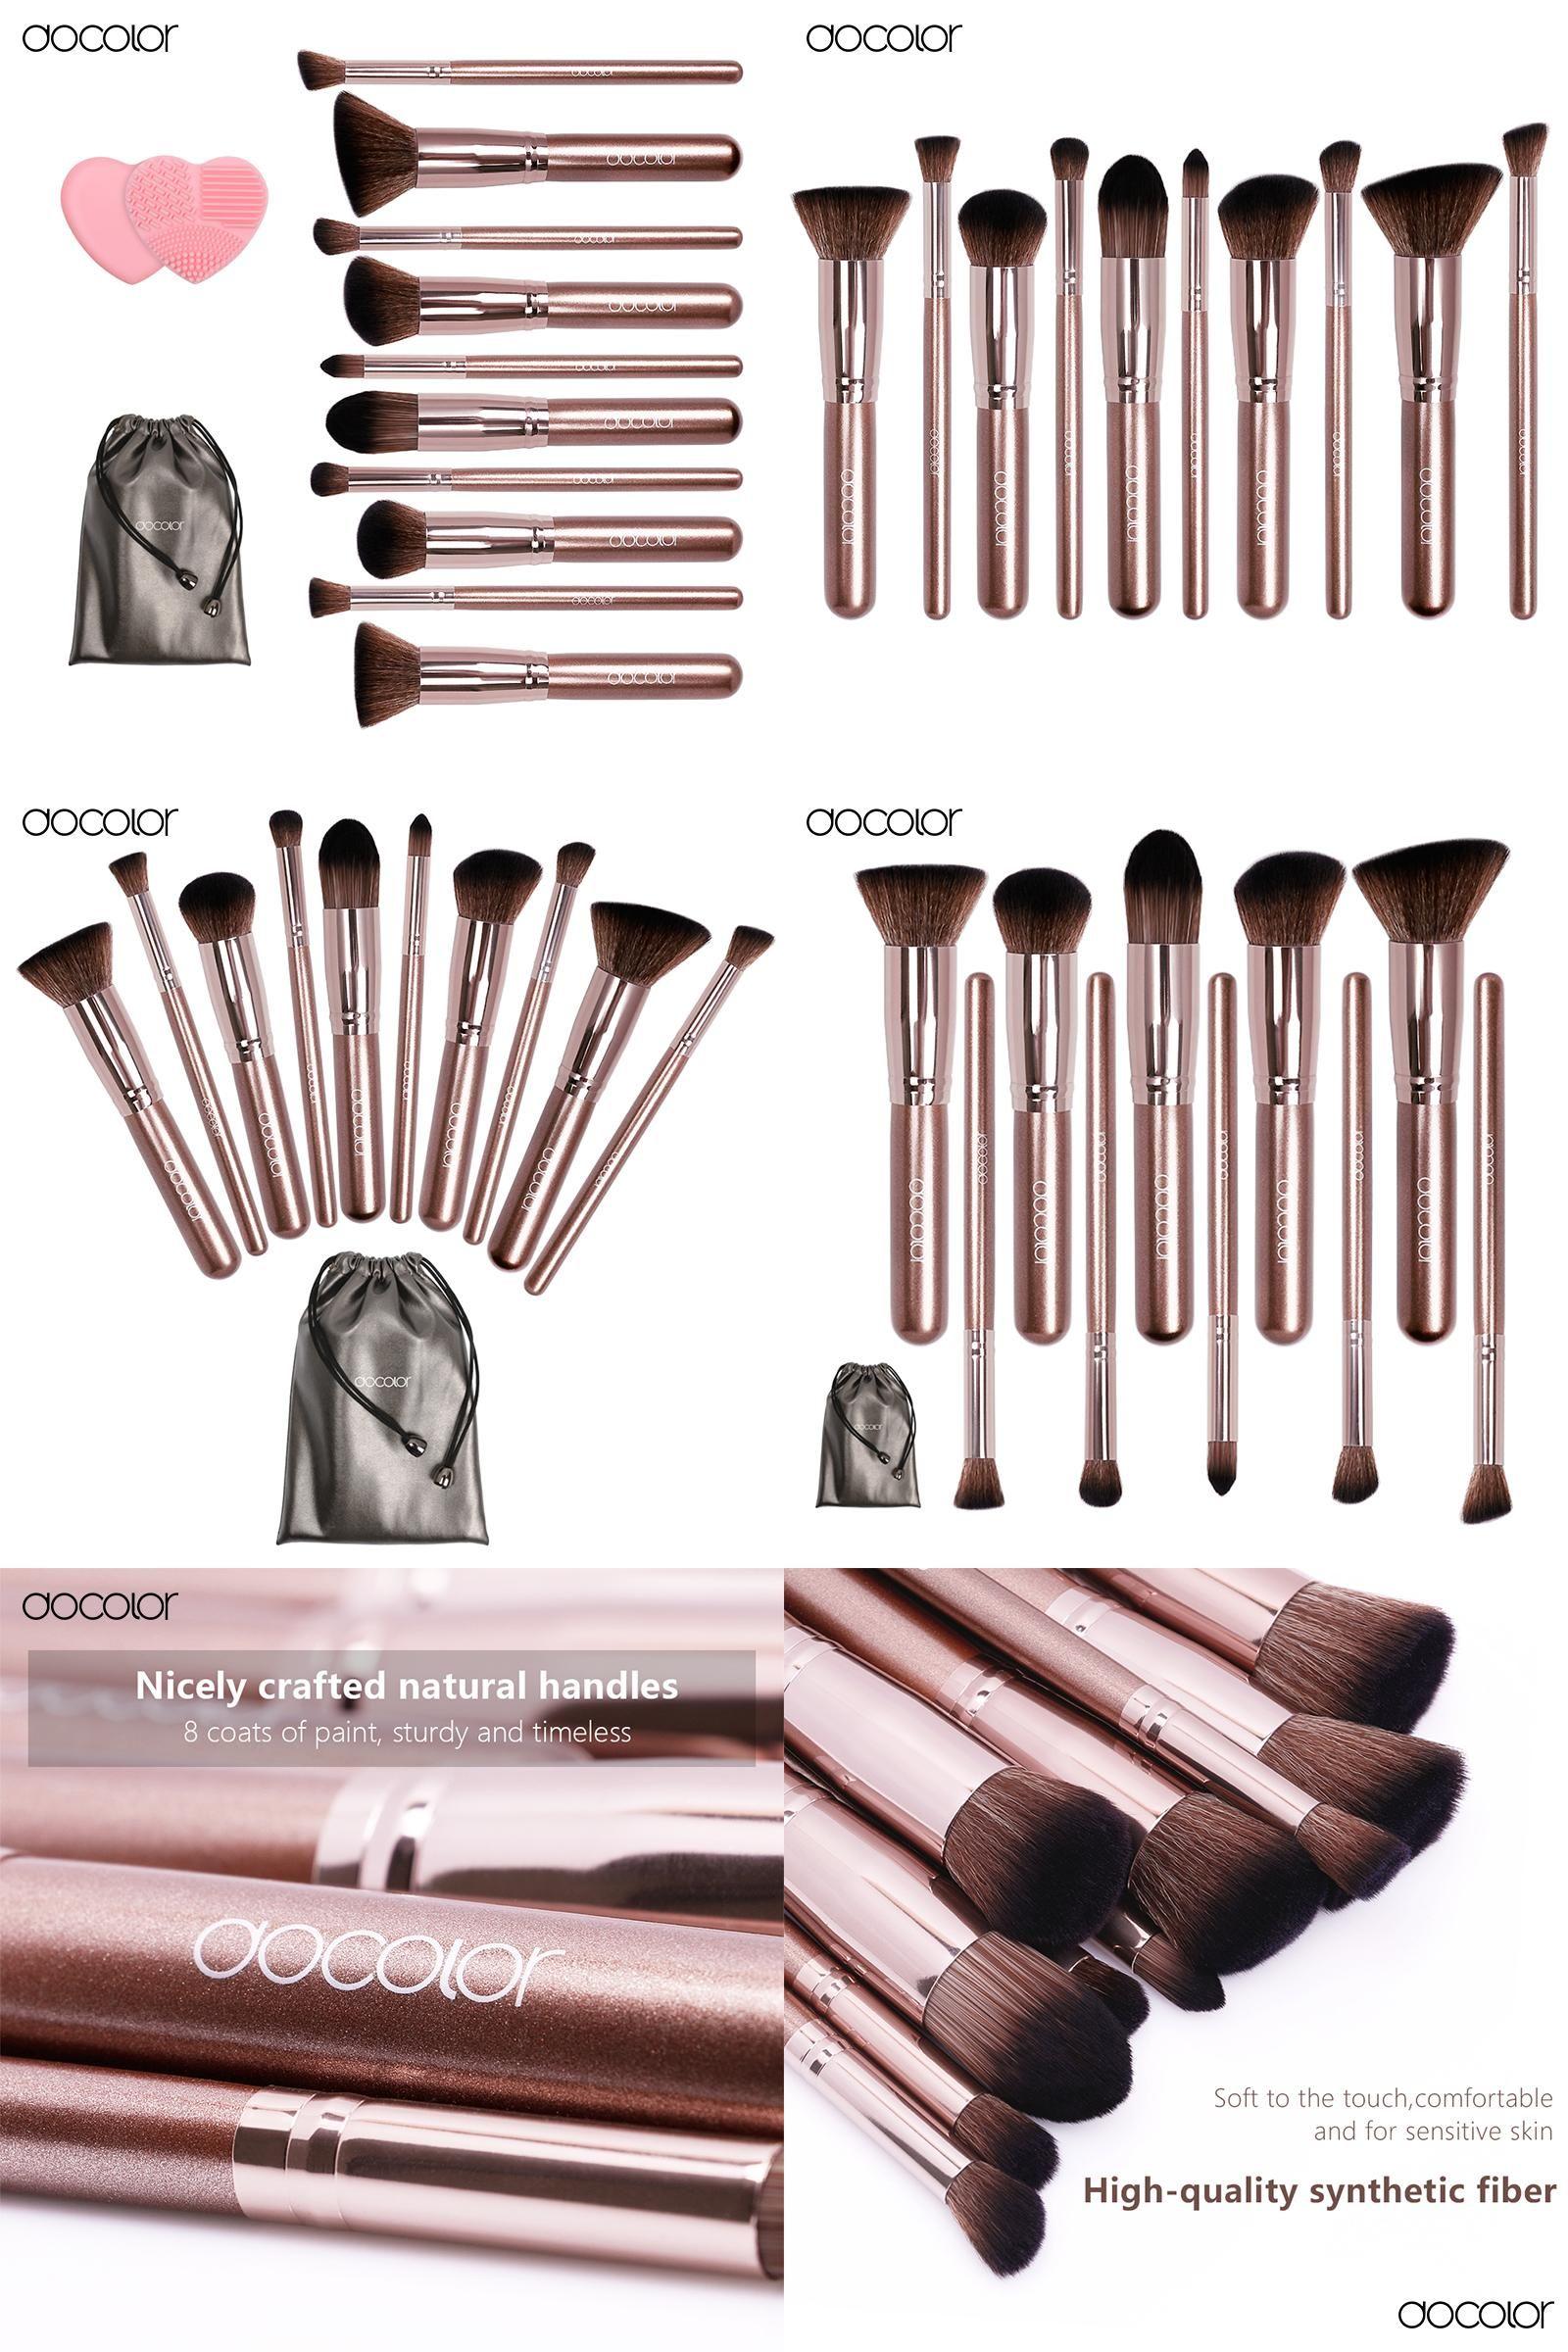 [Visit to Buy] Docolor makeup brushes 10pcs Professional